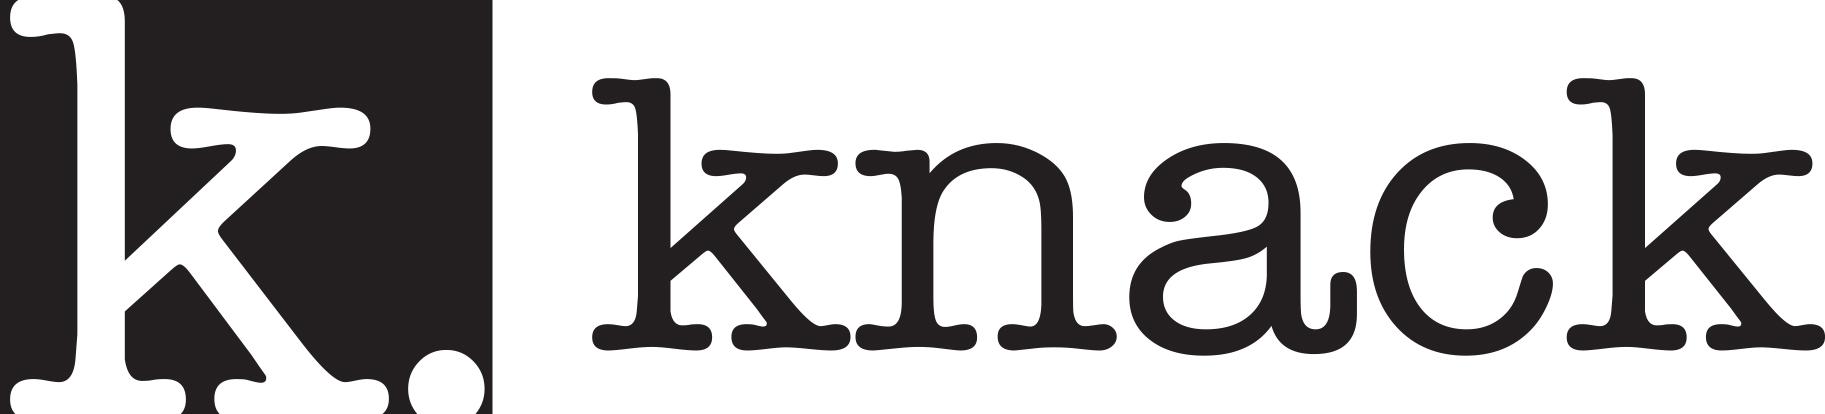 Booking - Knack Mastering - Analog and Digital Audio Mastering